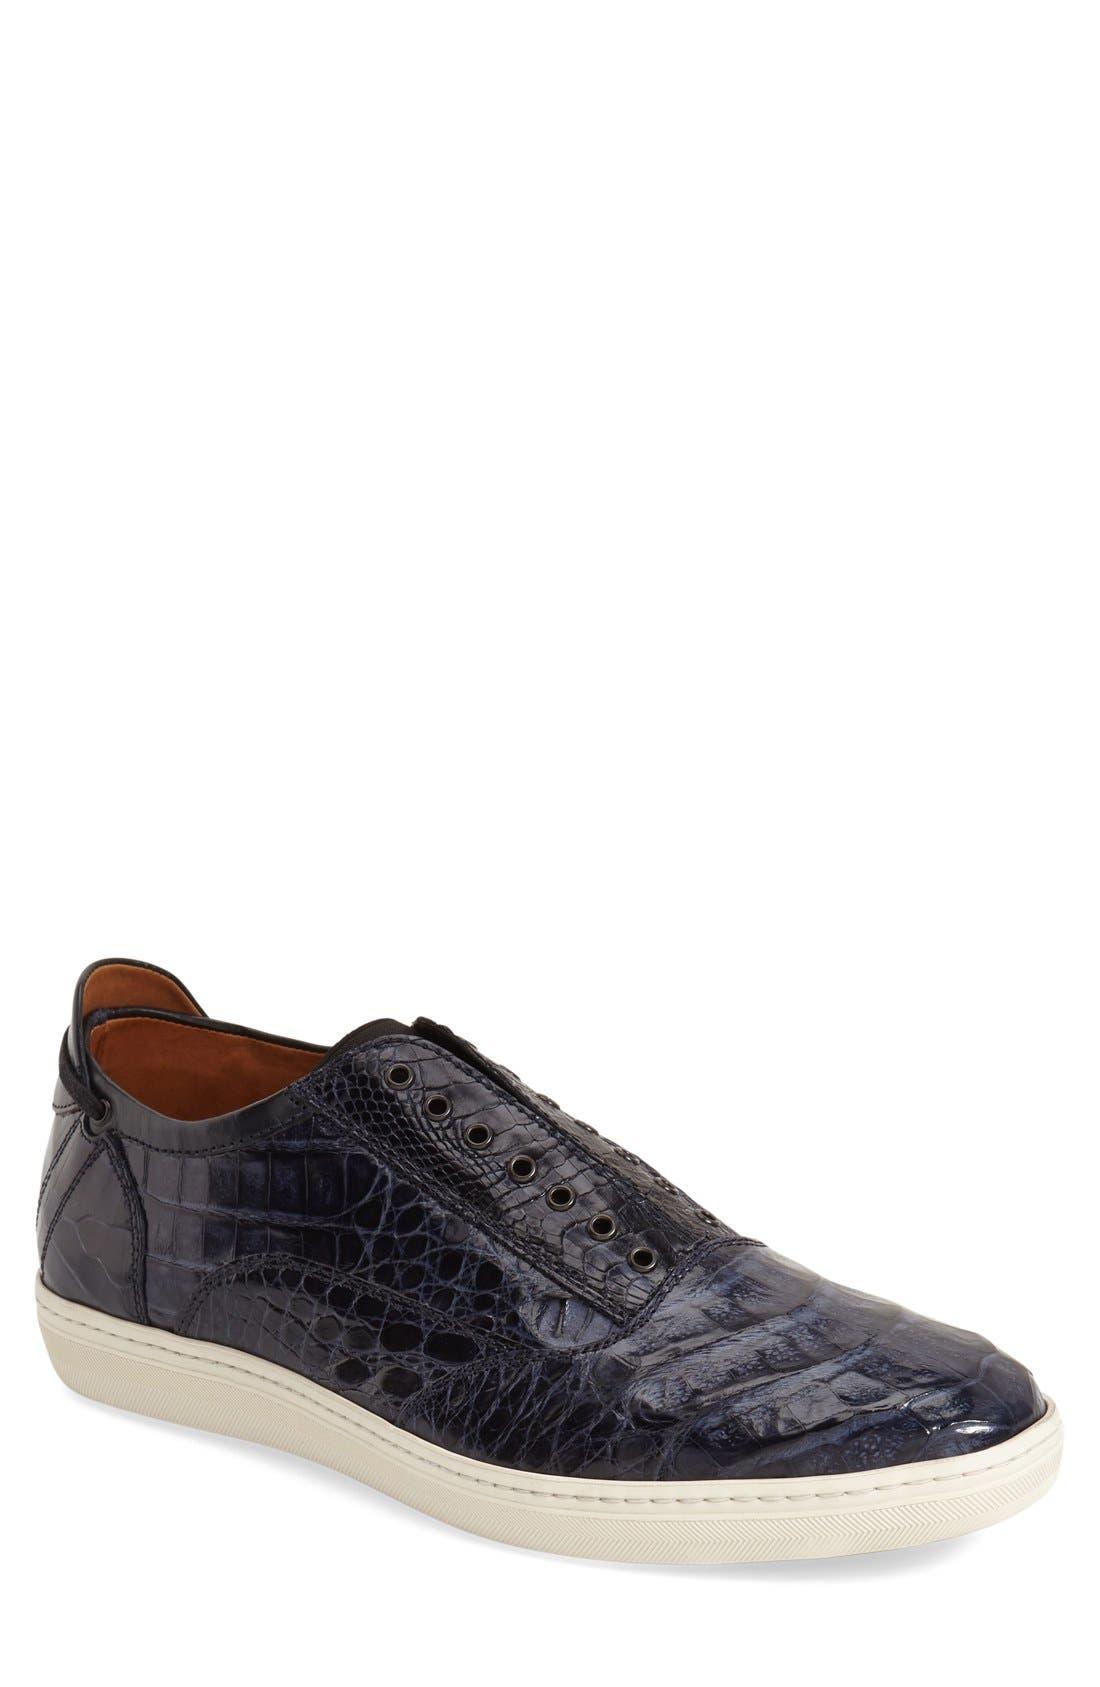 'Emmanuel' Slip-on Sneaker,                             Main thumbnail 3, color,